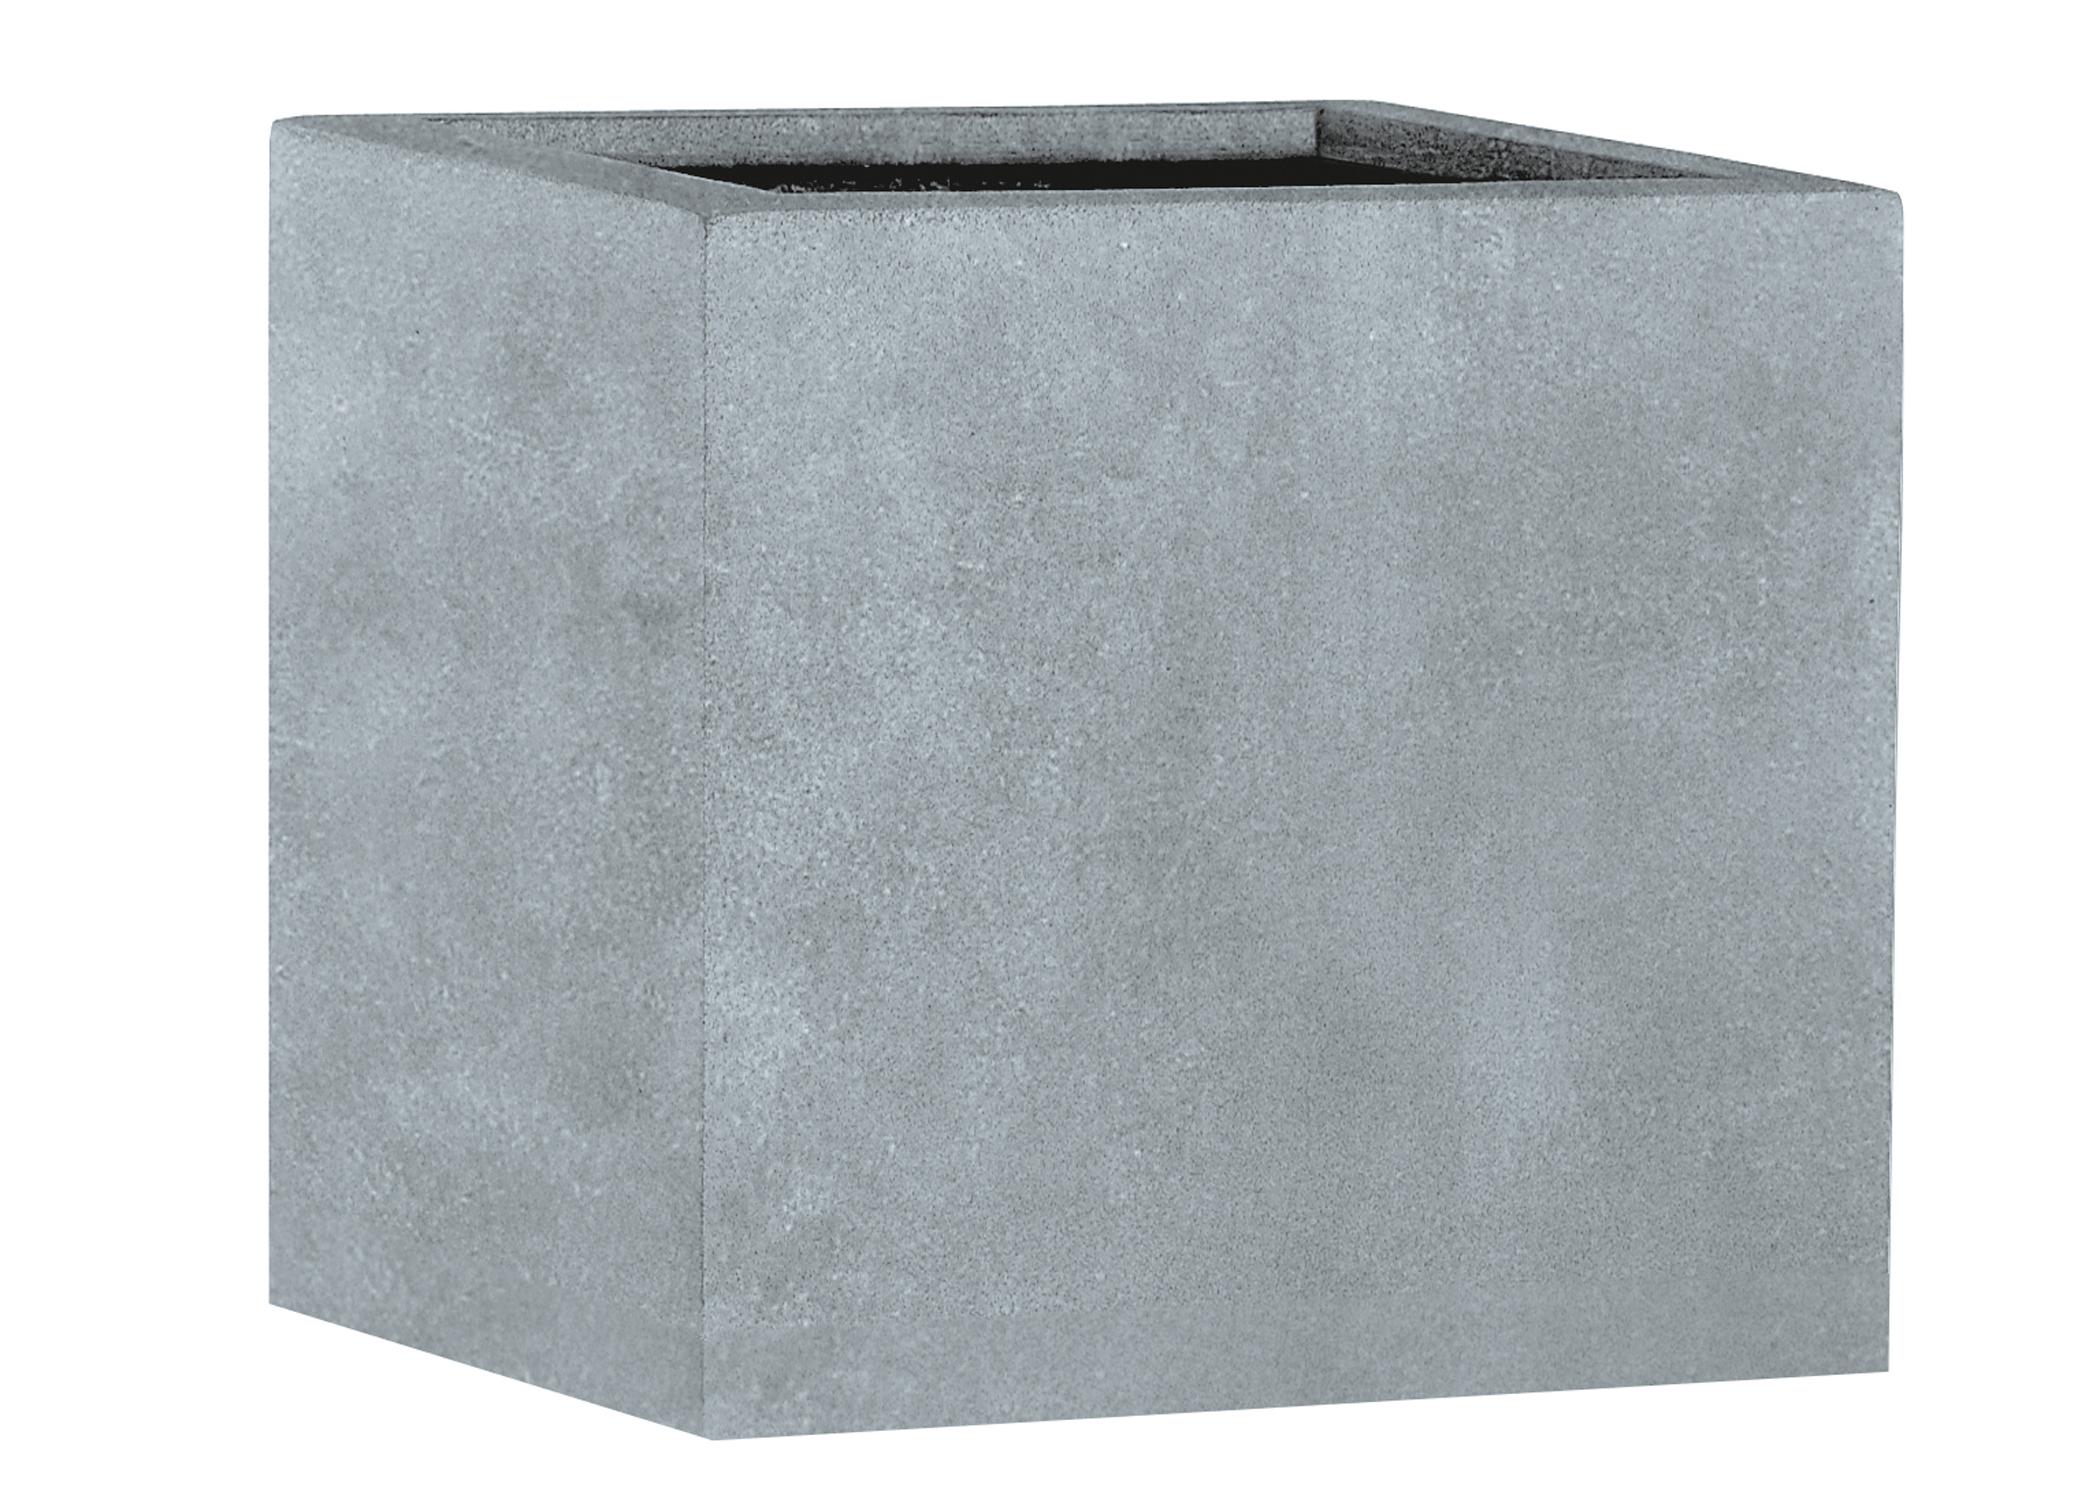 fiberglas pflanzk bel esteras lisburn 57 bleifarben. Black Bedroom Furniture Sets. Home Design Ideas